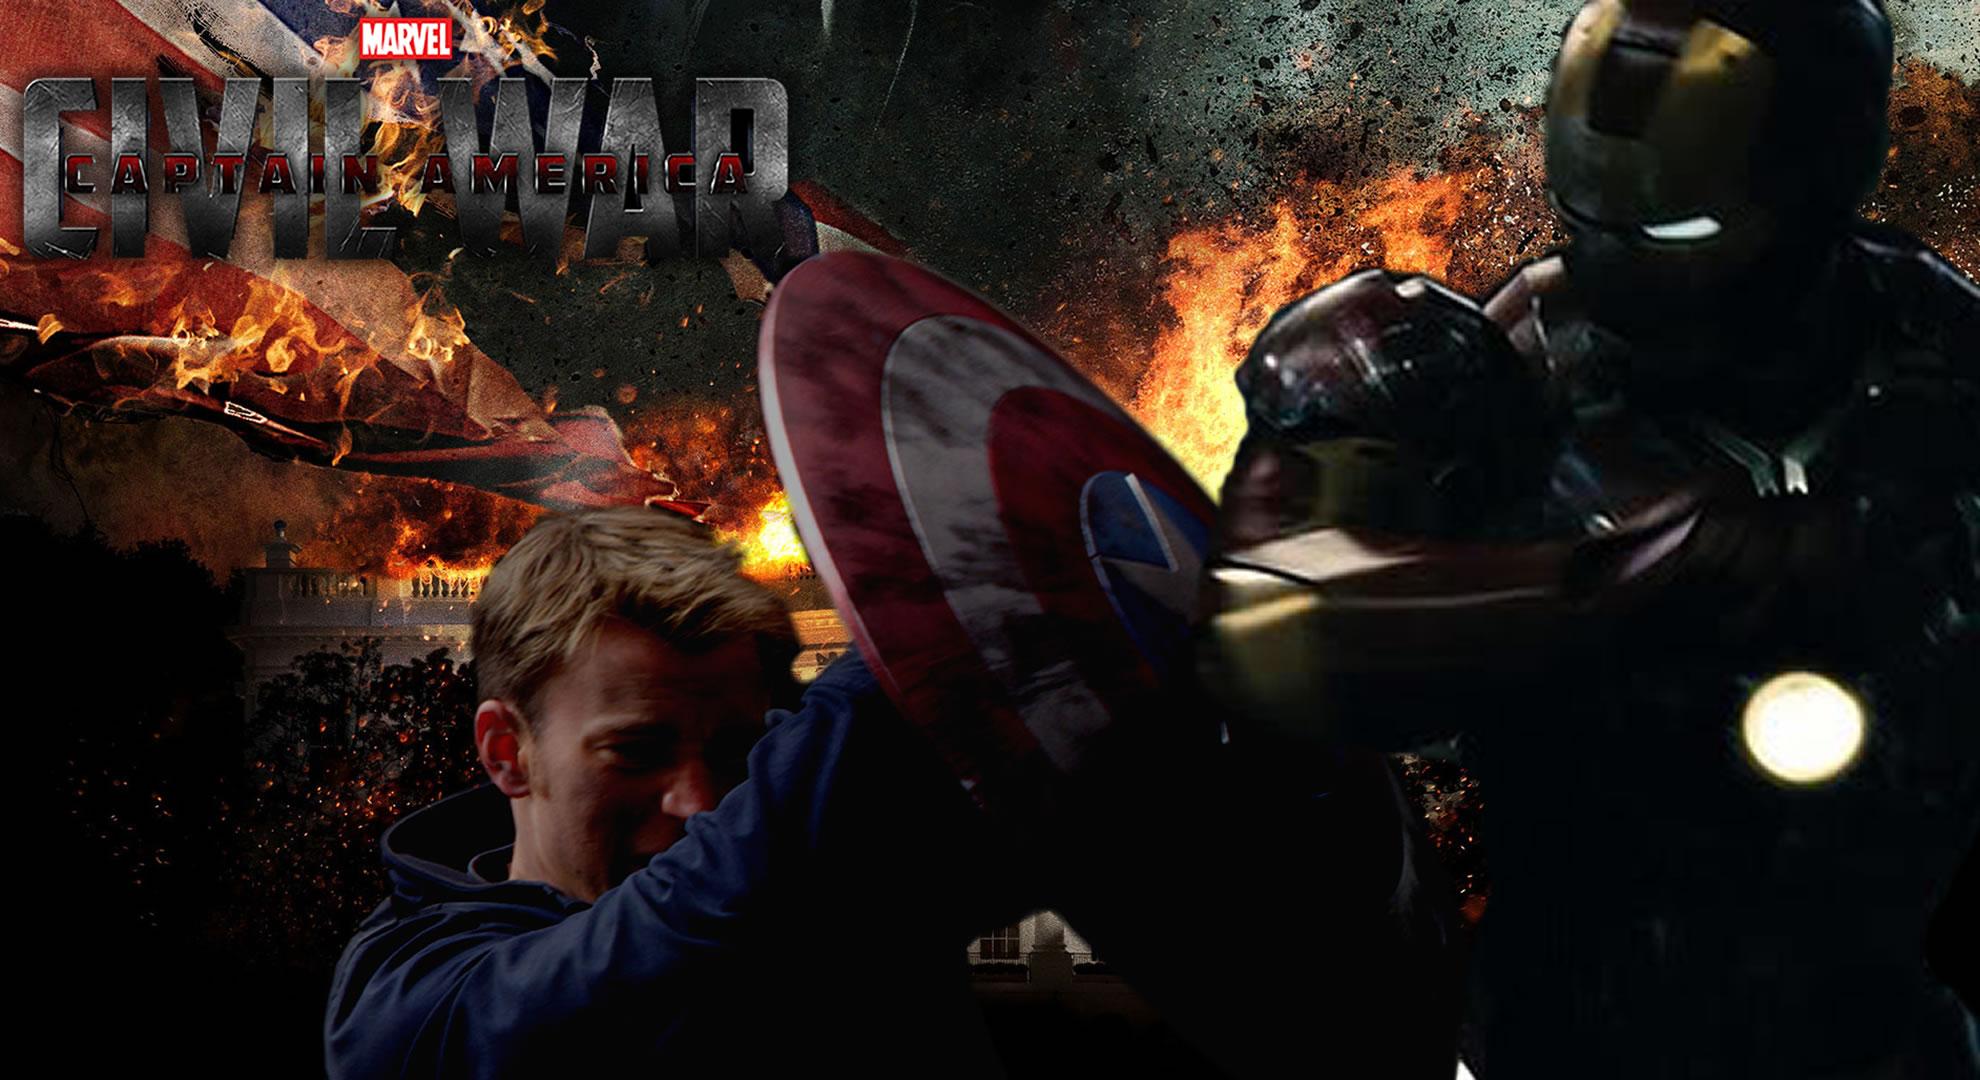 Captain America Civil War Wallpaper 4 1980x1080